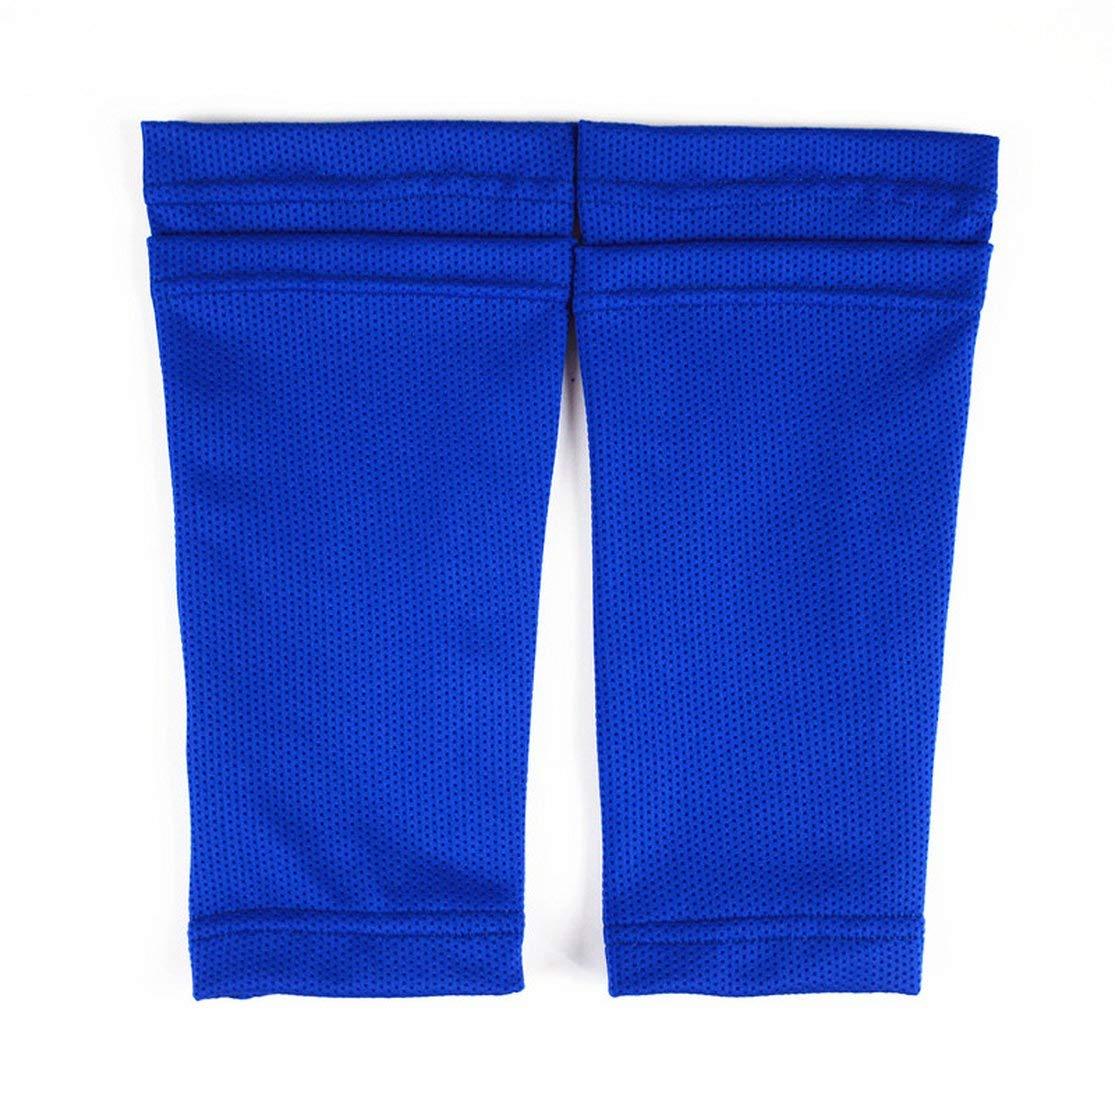 Kaemma Professional Soccer Shin Pads Holder Sports Instep Foot Socks Breathable Nylon Football Shin Guards Lock Sleeves